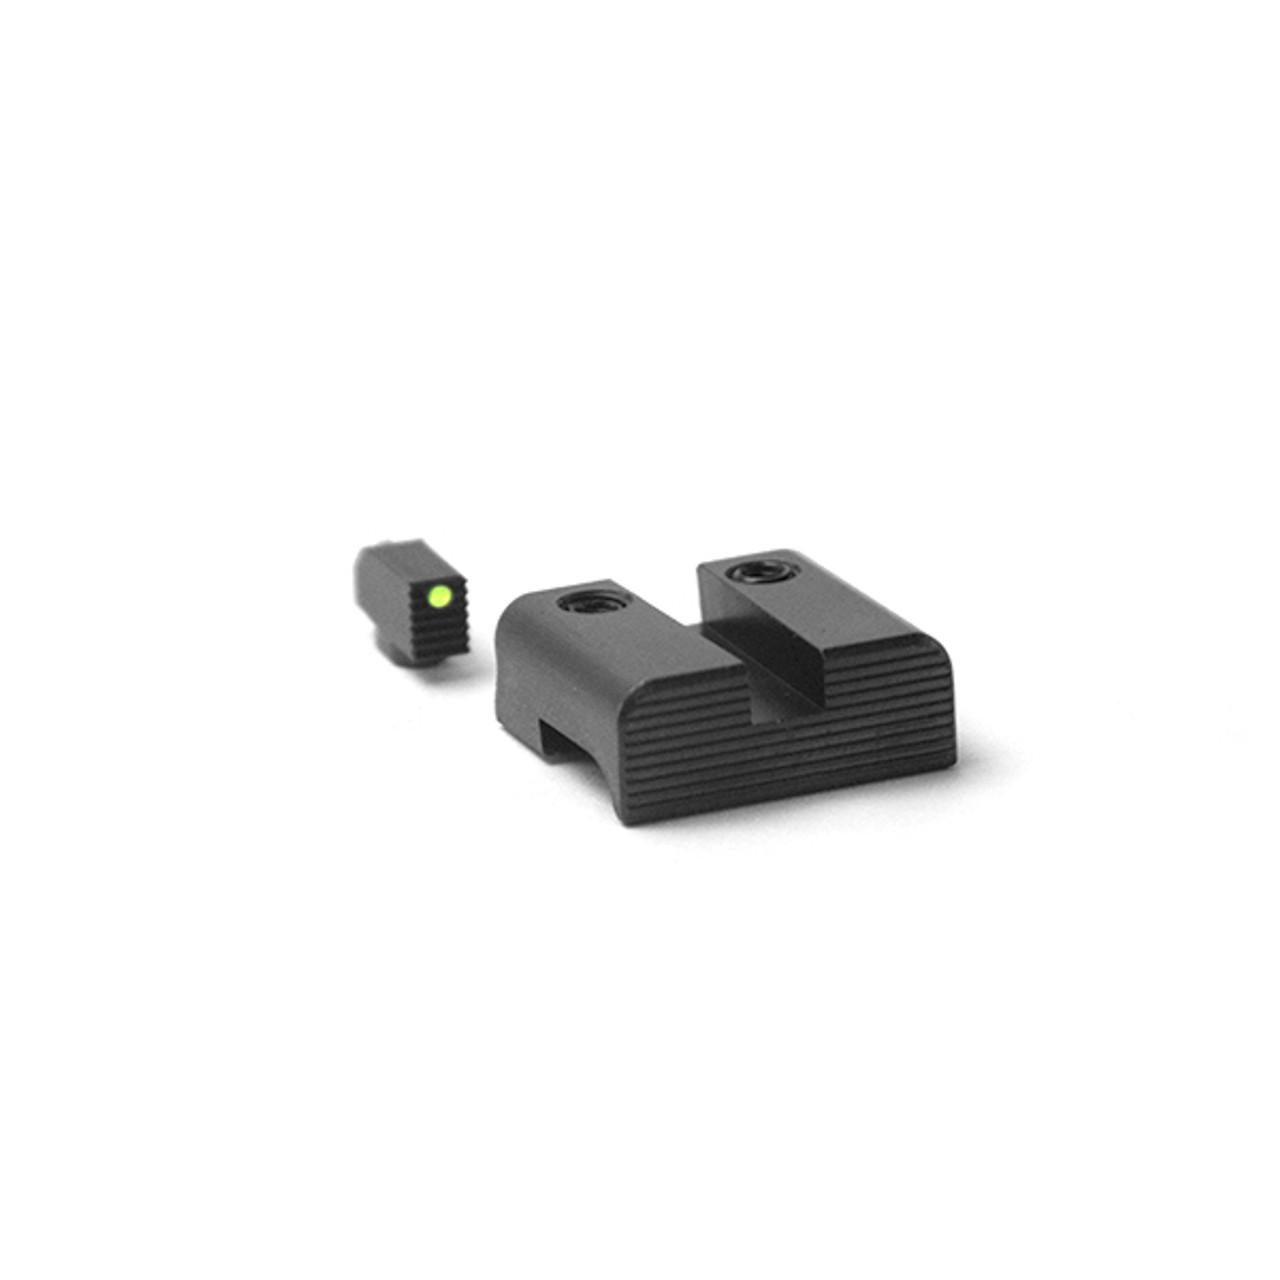 Henning - Battle Hook Fiber Front & Black Rear Sight Set